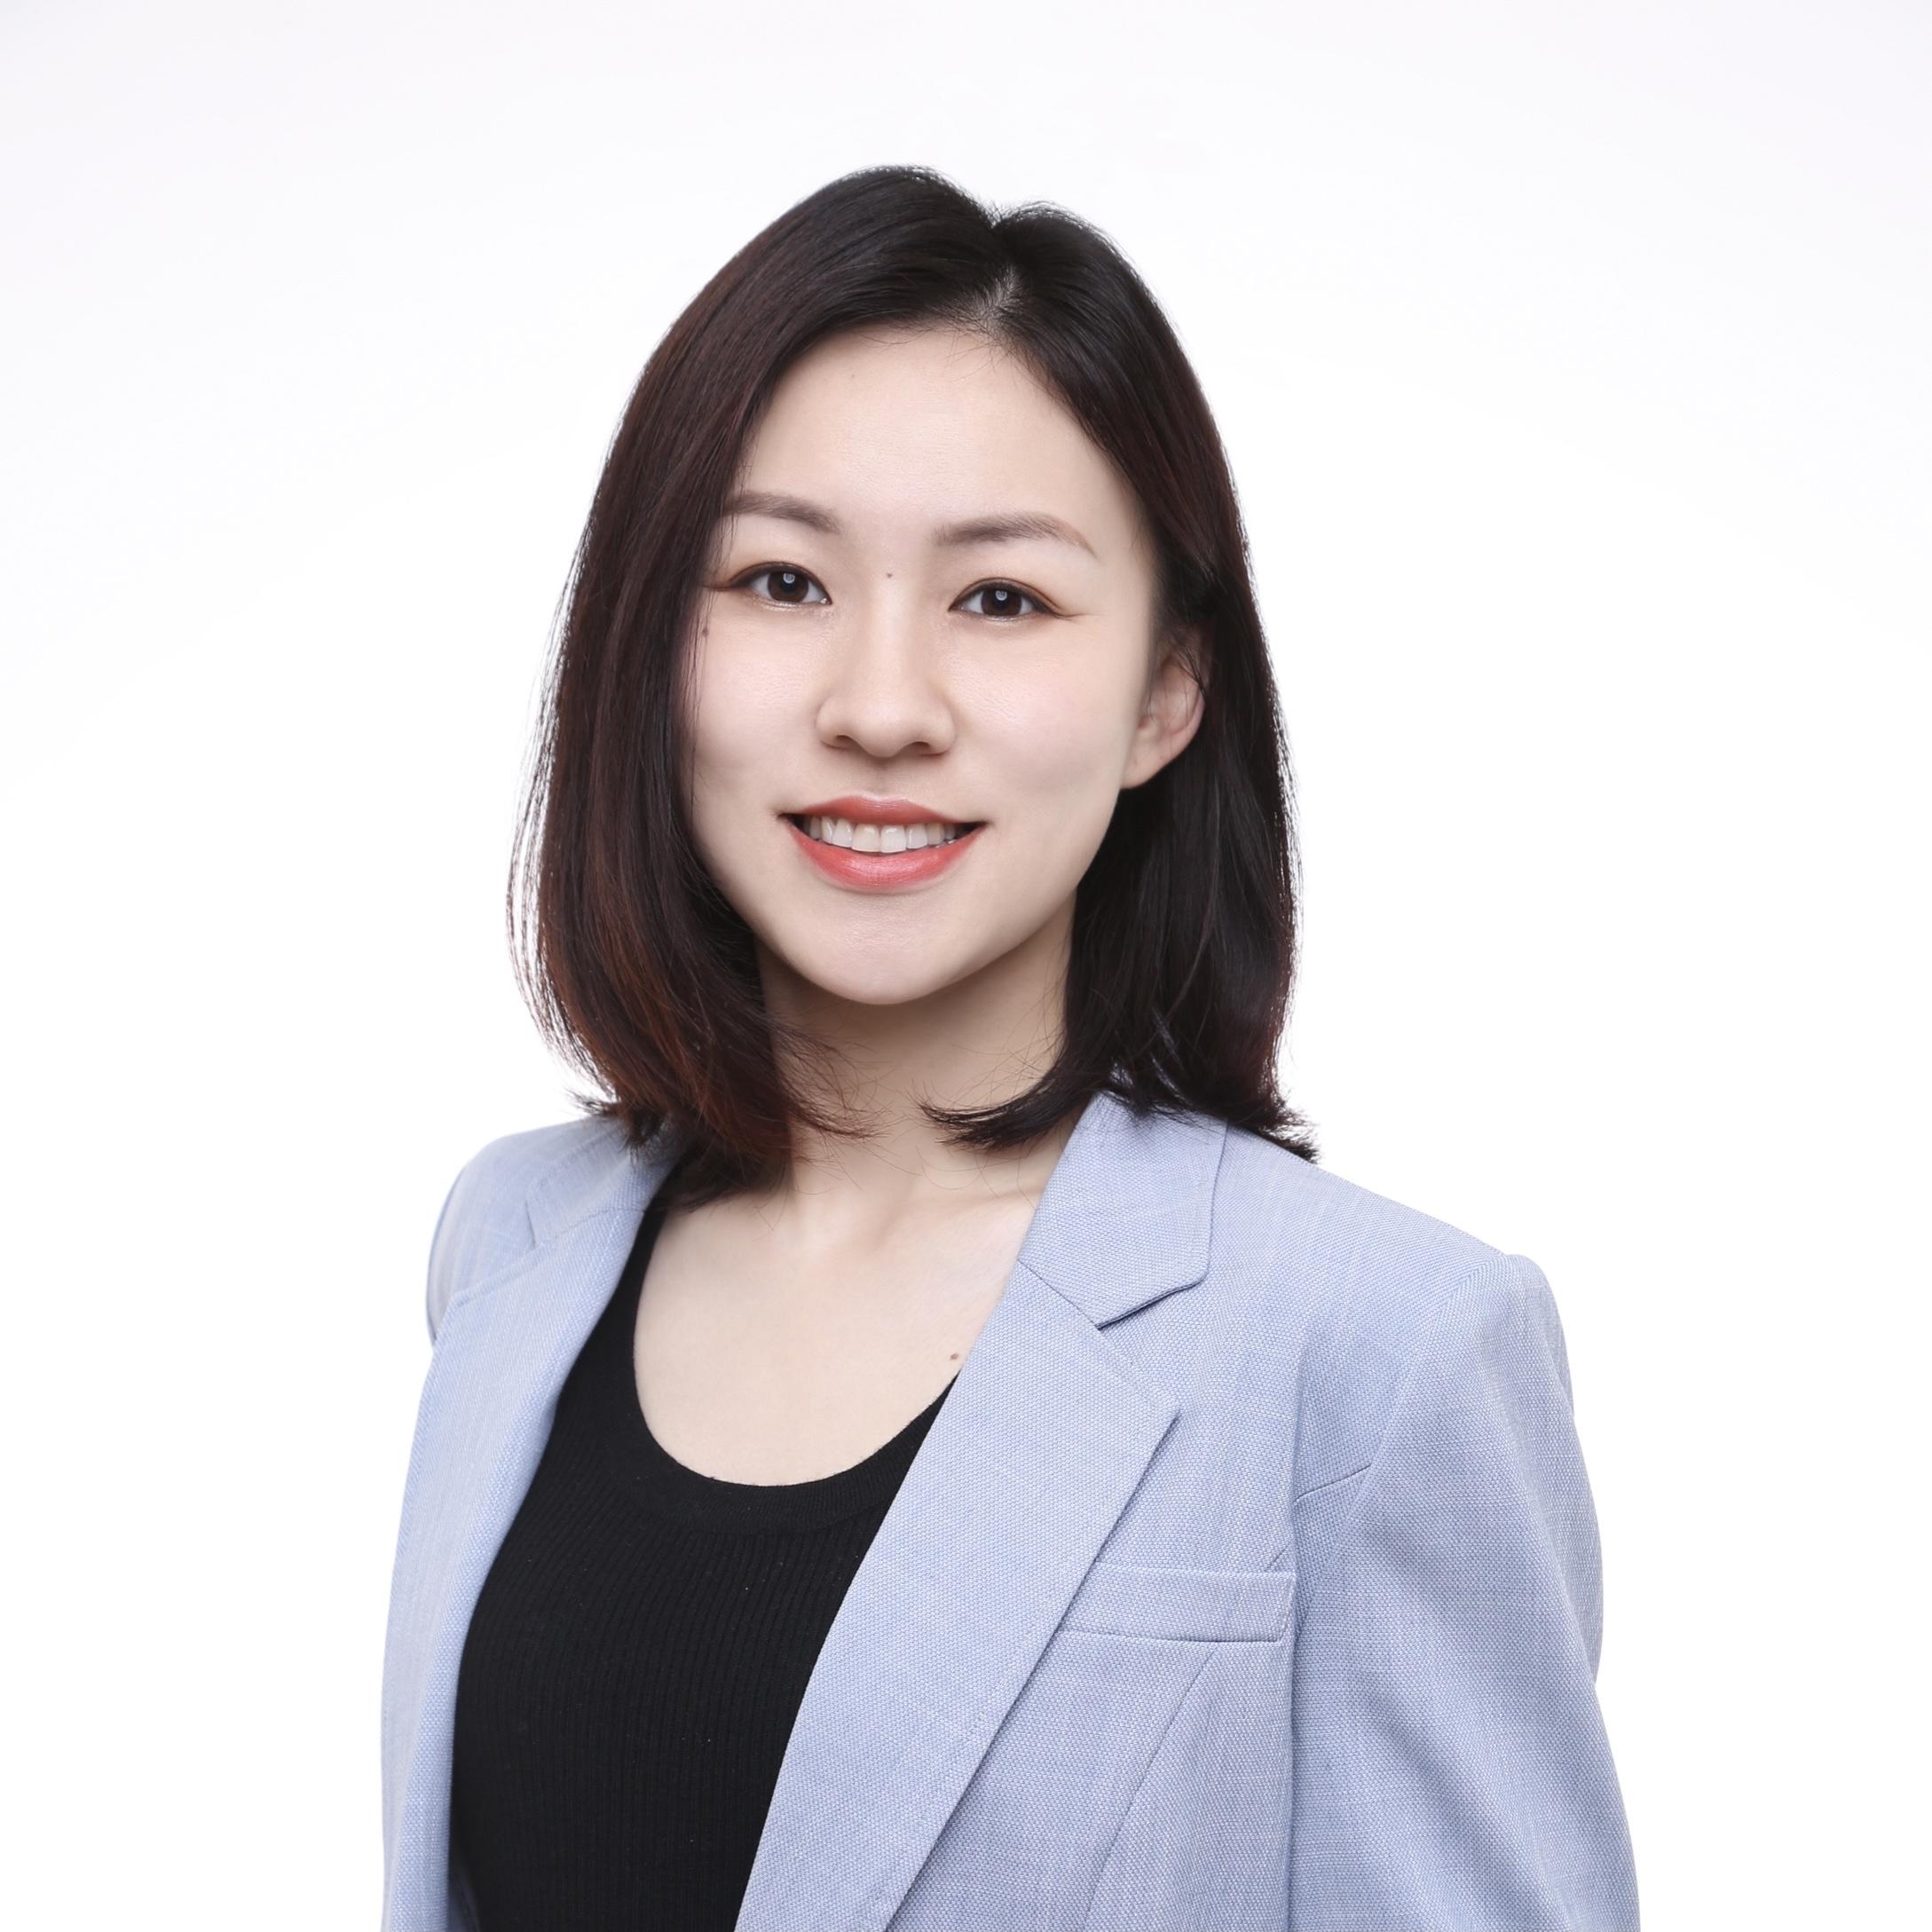 Mengdi Yue